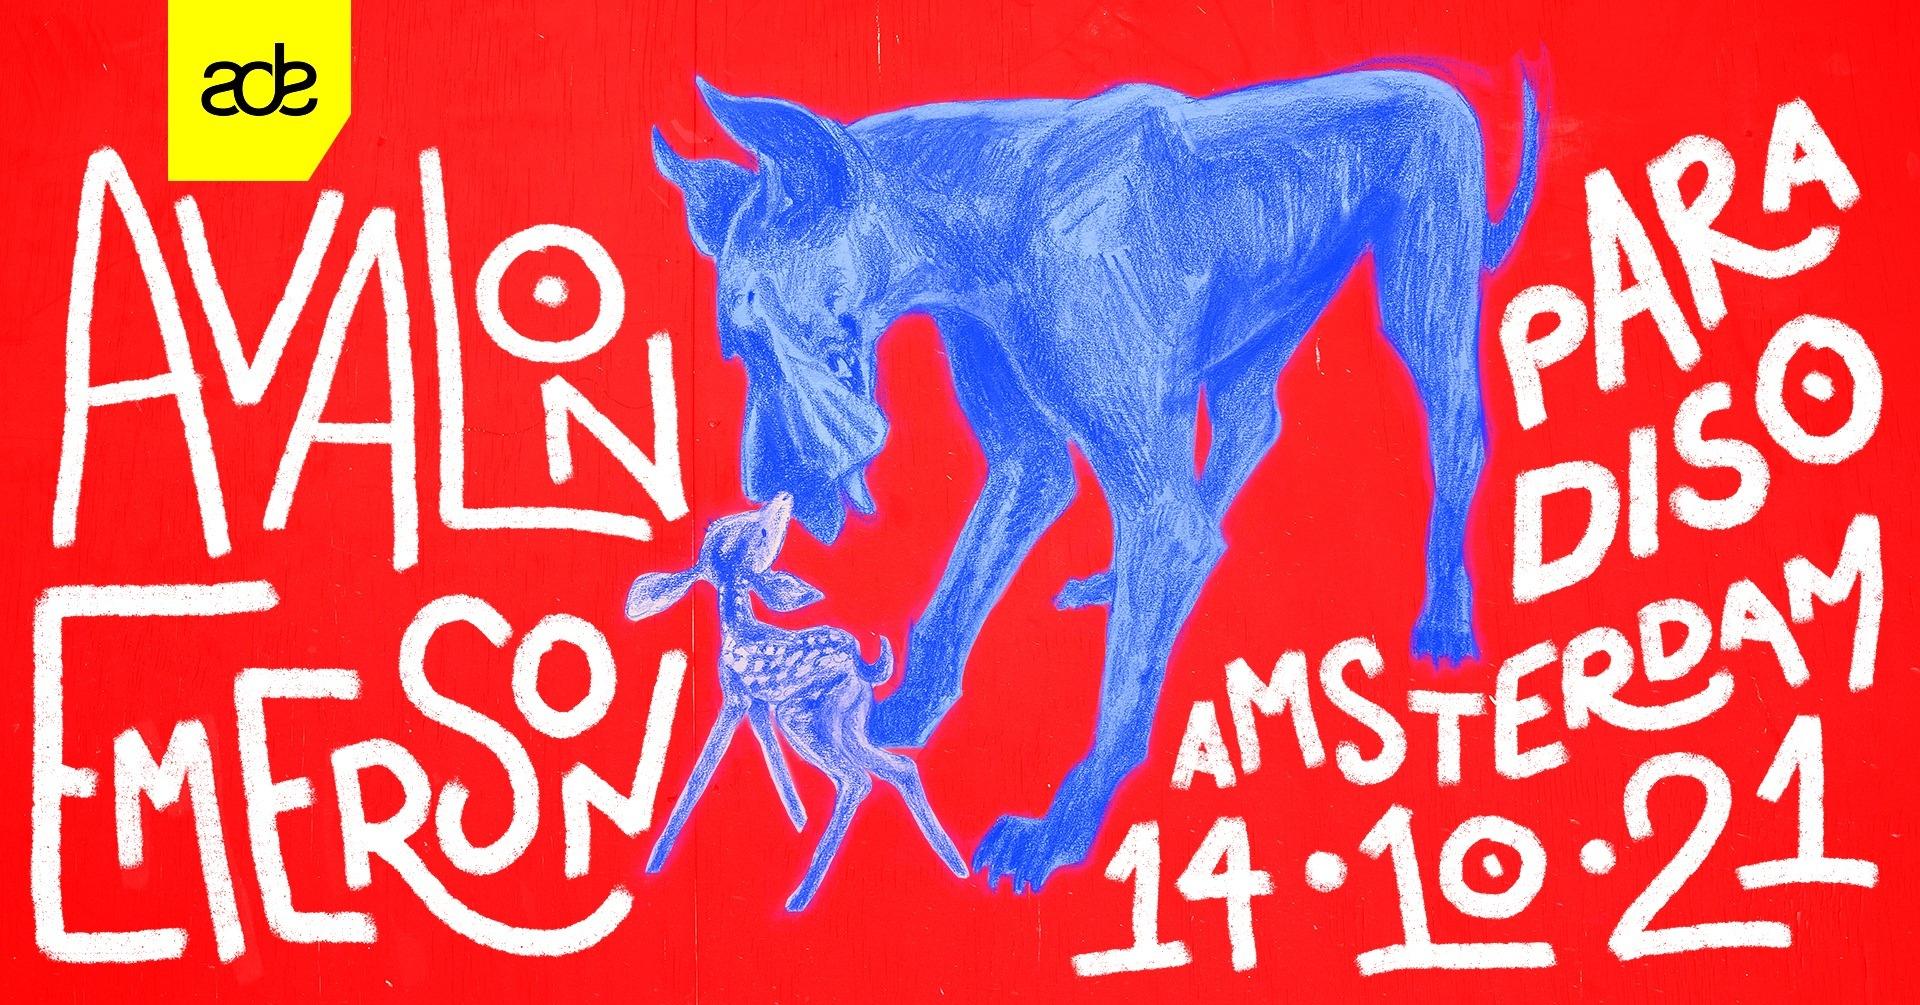 Avalon Emerson